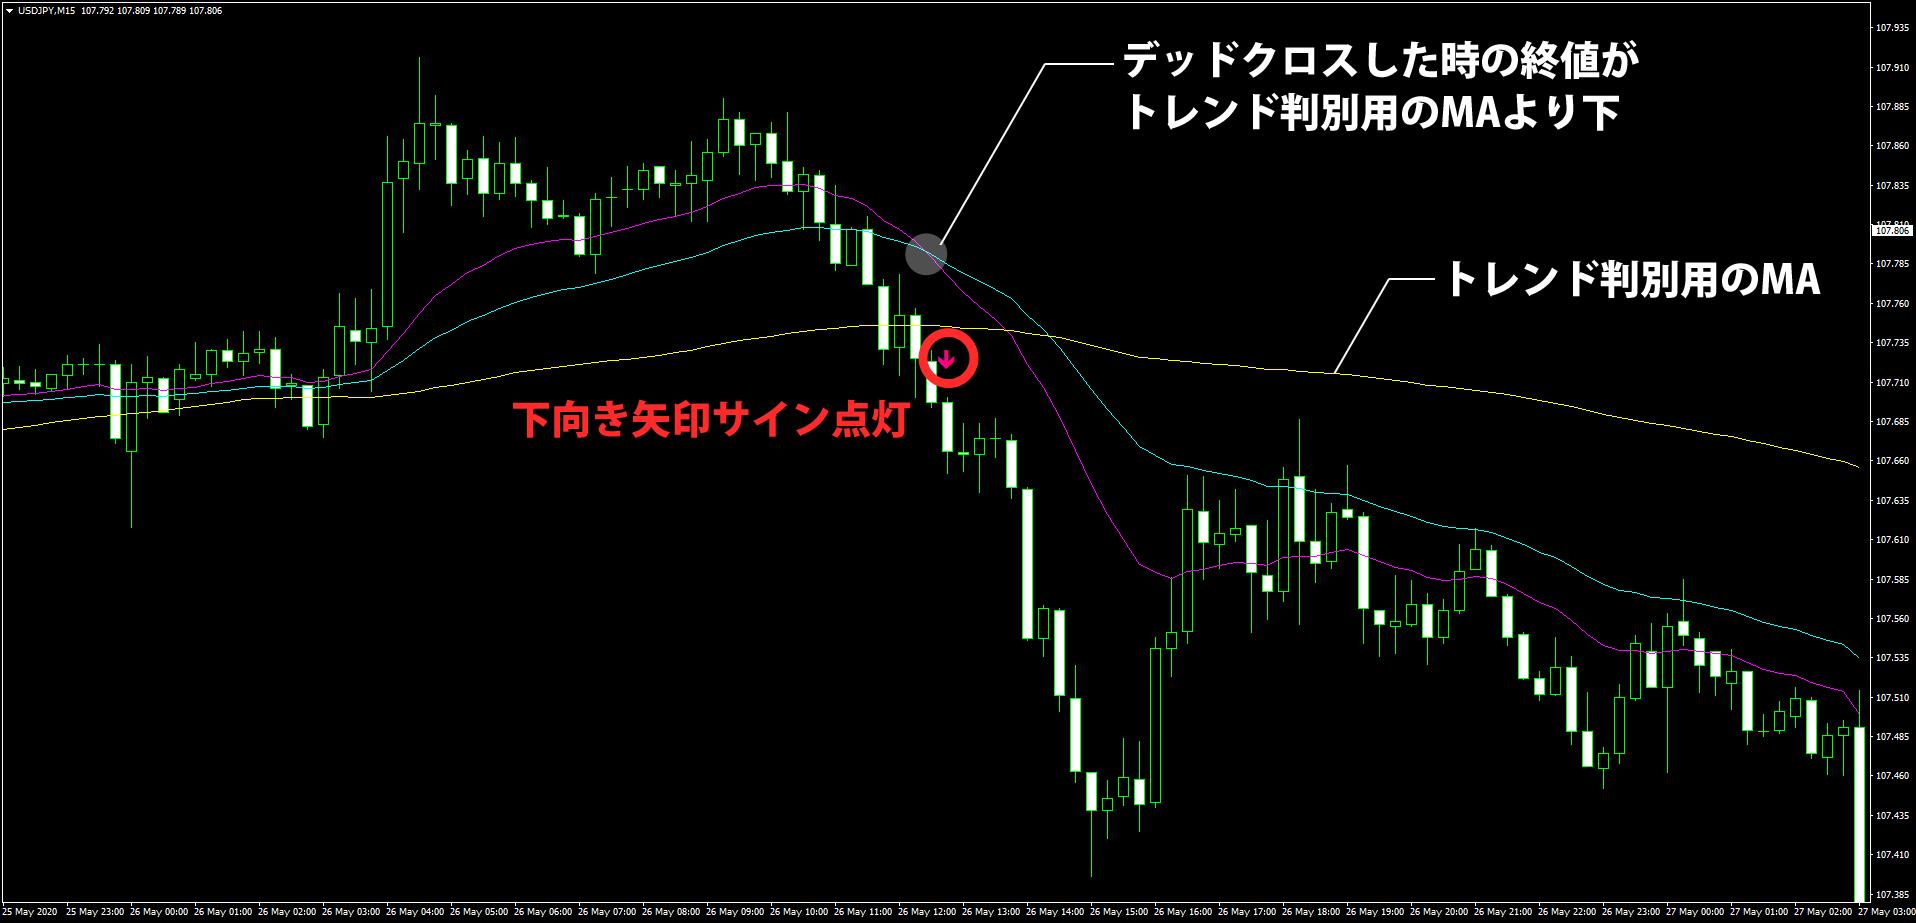 MA-CrossAlert-Trendで下向き矢印サインが出る条件